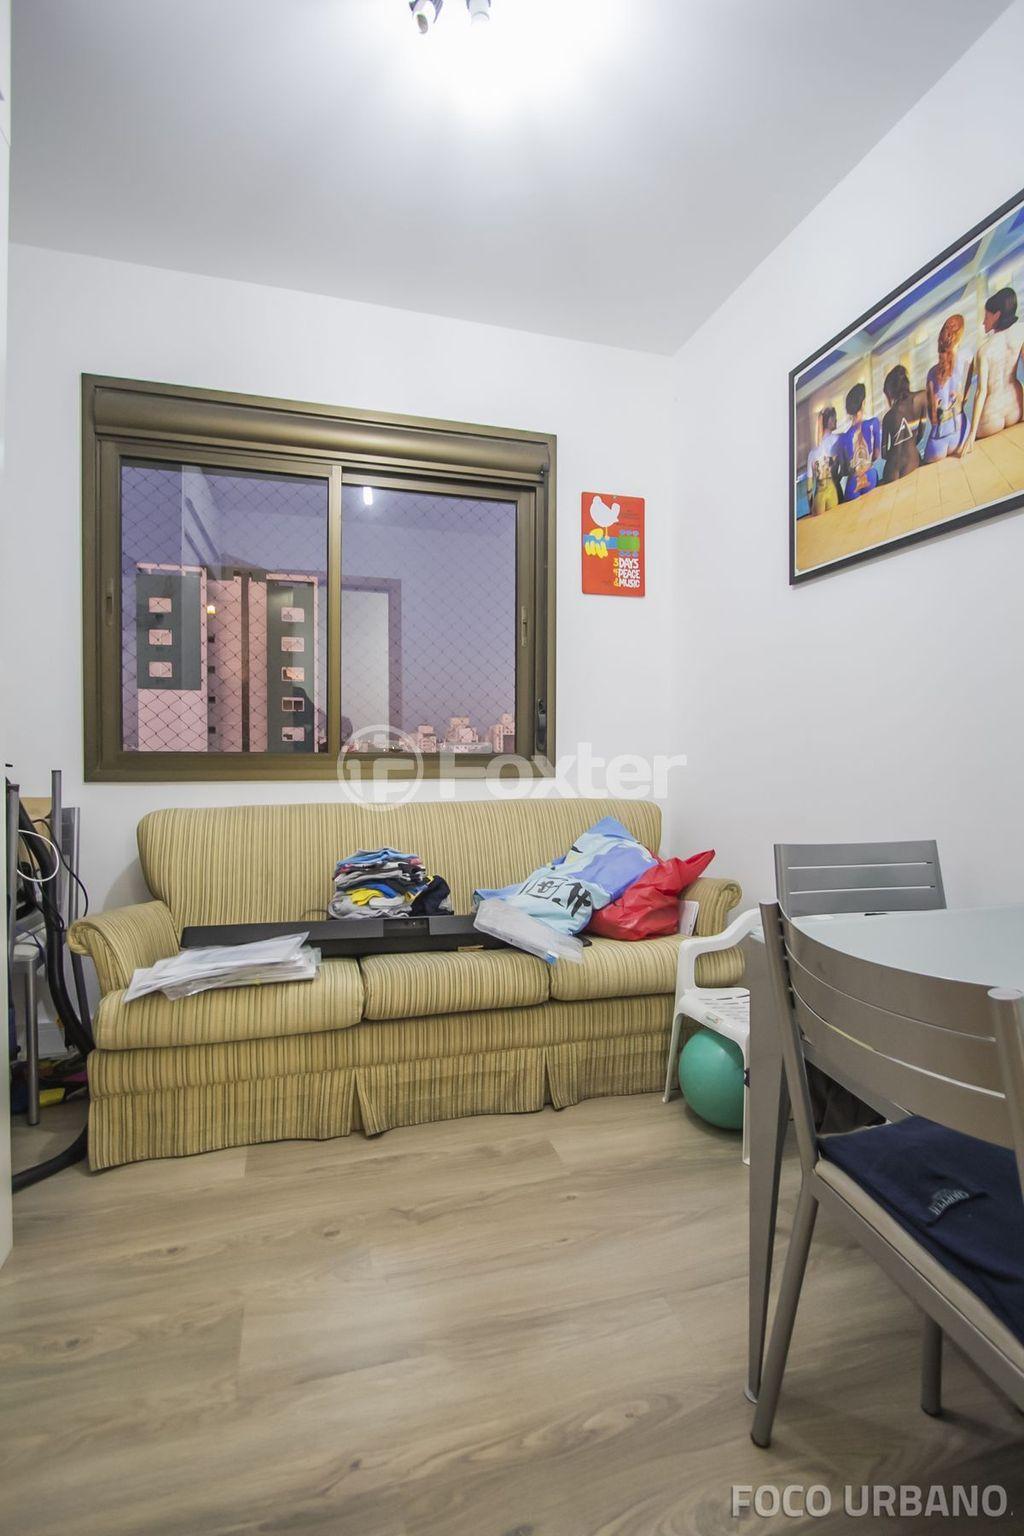 Apto 3 Dorm, Passo D'areia, Porto Alegre (143661) - Foto 20